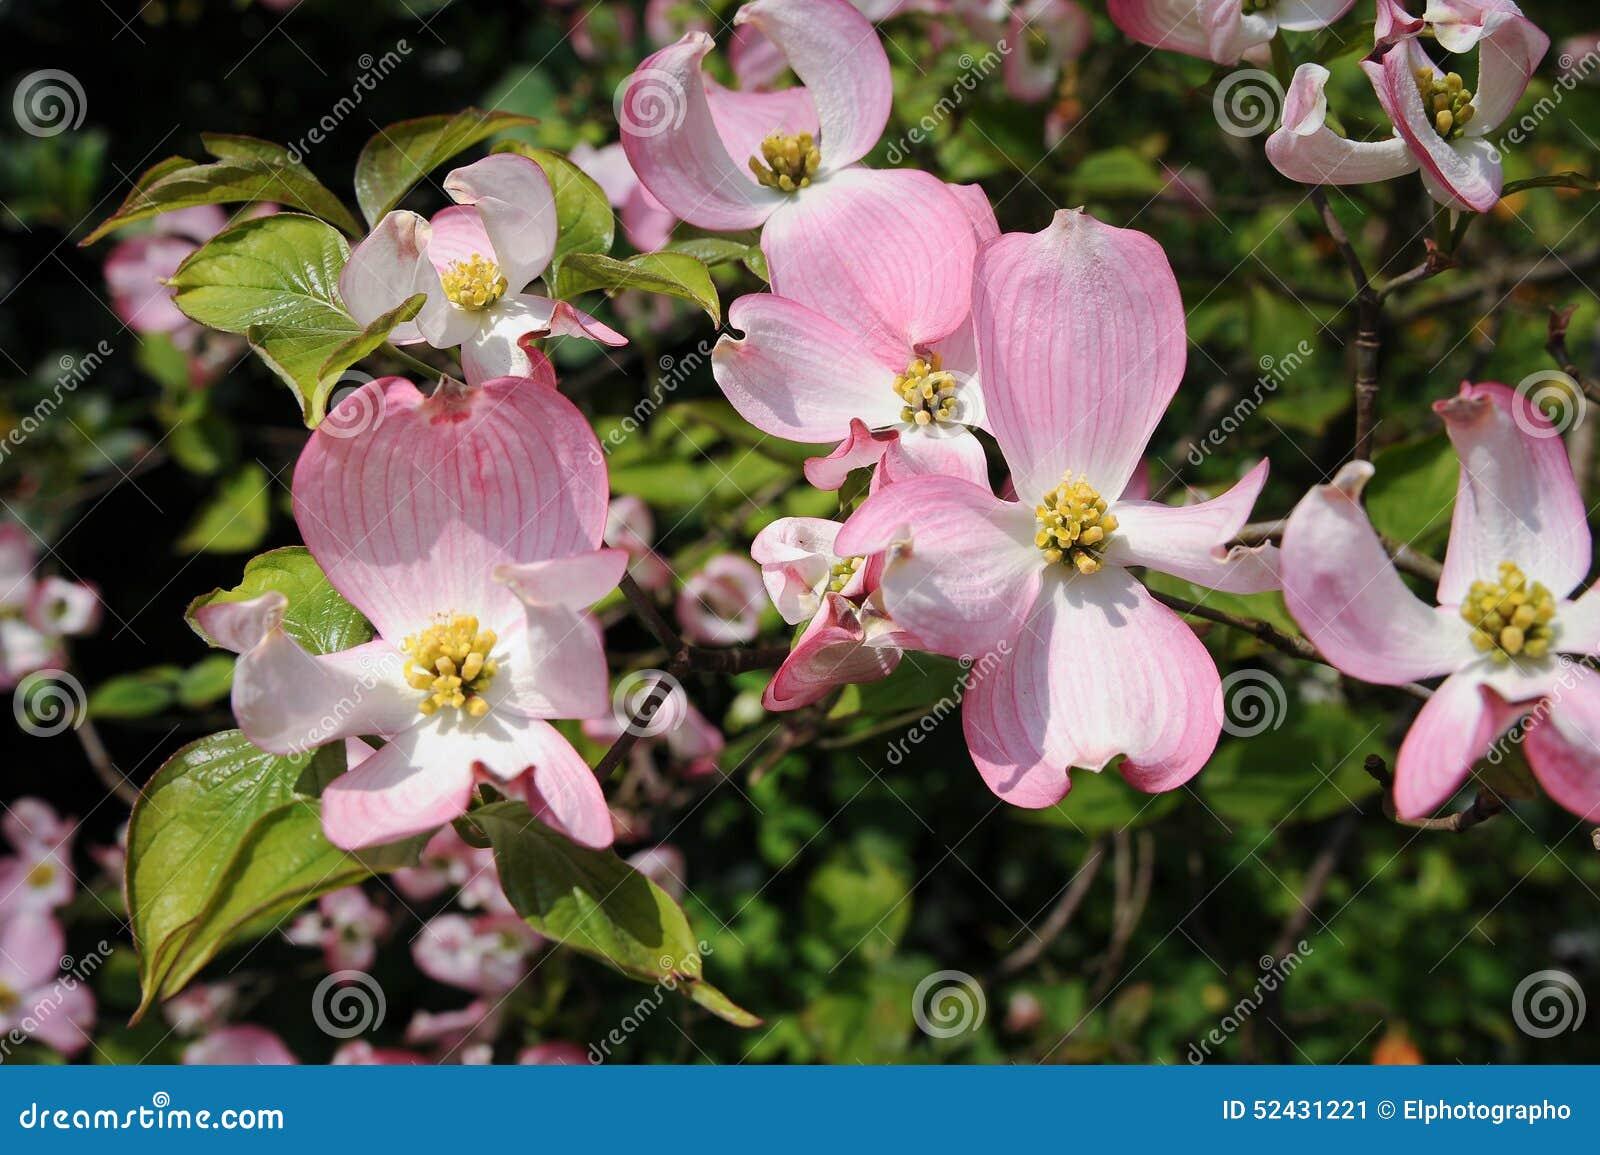 flowering dogwood cornus florida rubra pink flowers stock image image of botany dogwood. Black Bedroom Furniture Sets. Home Design Ideas